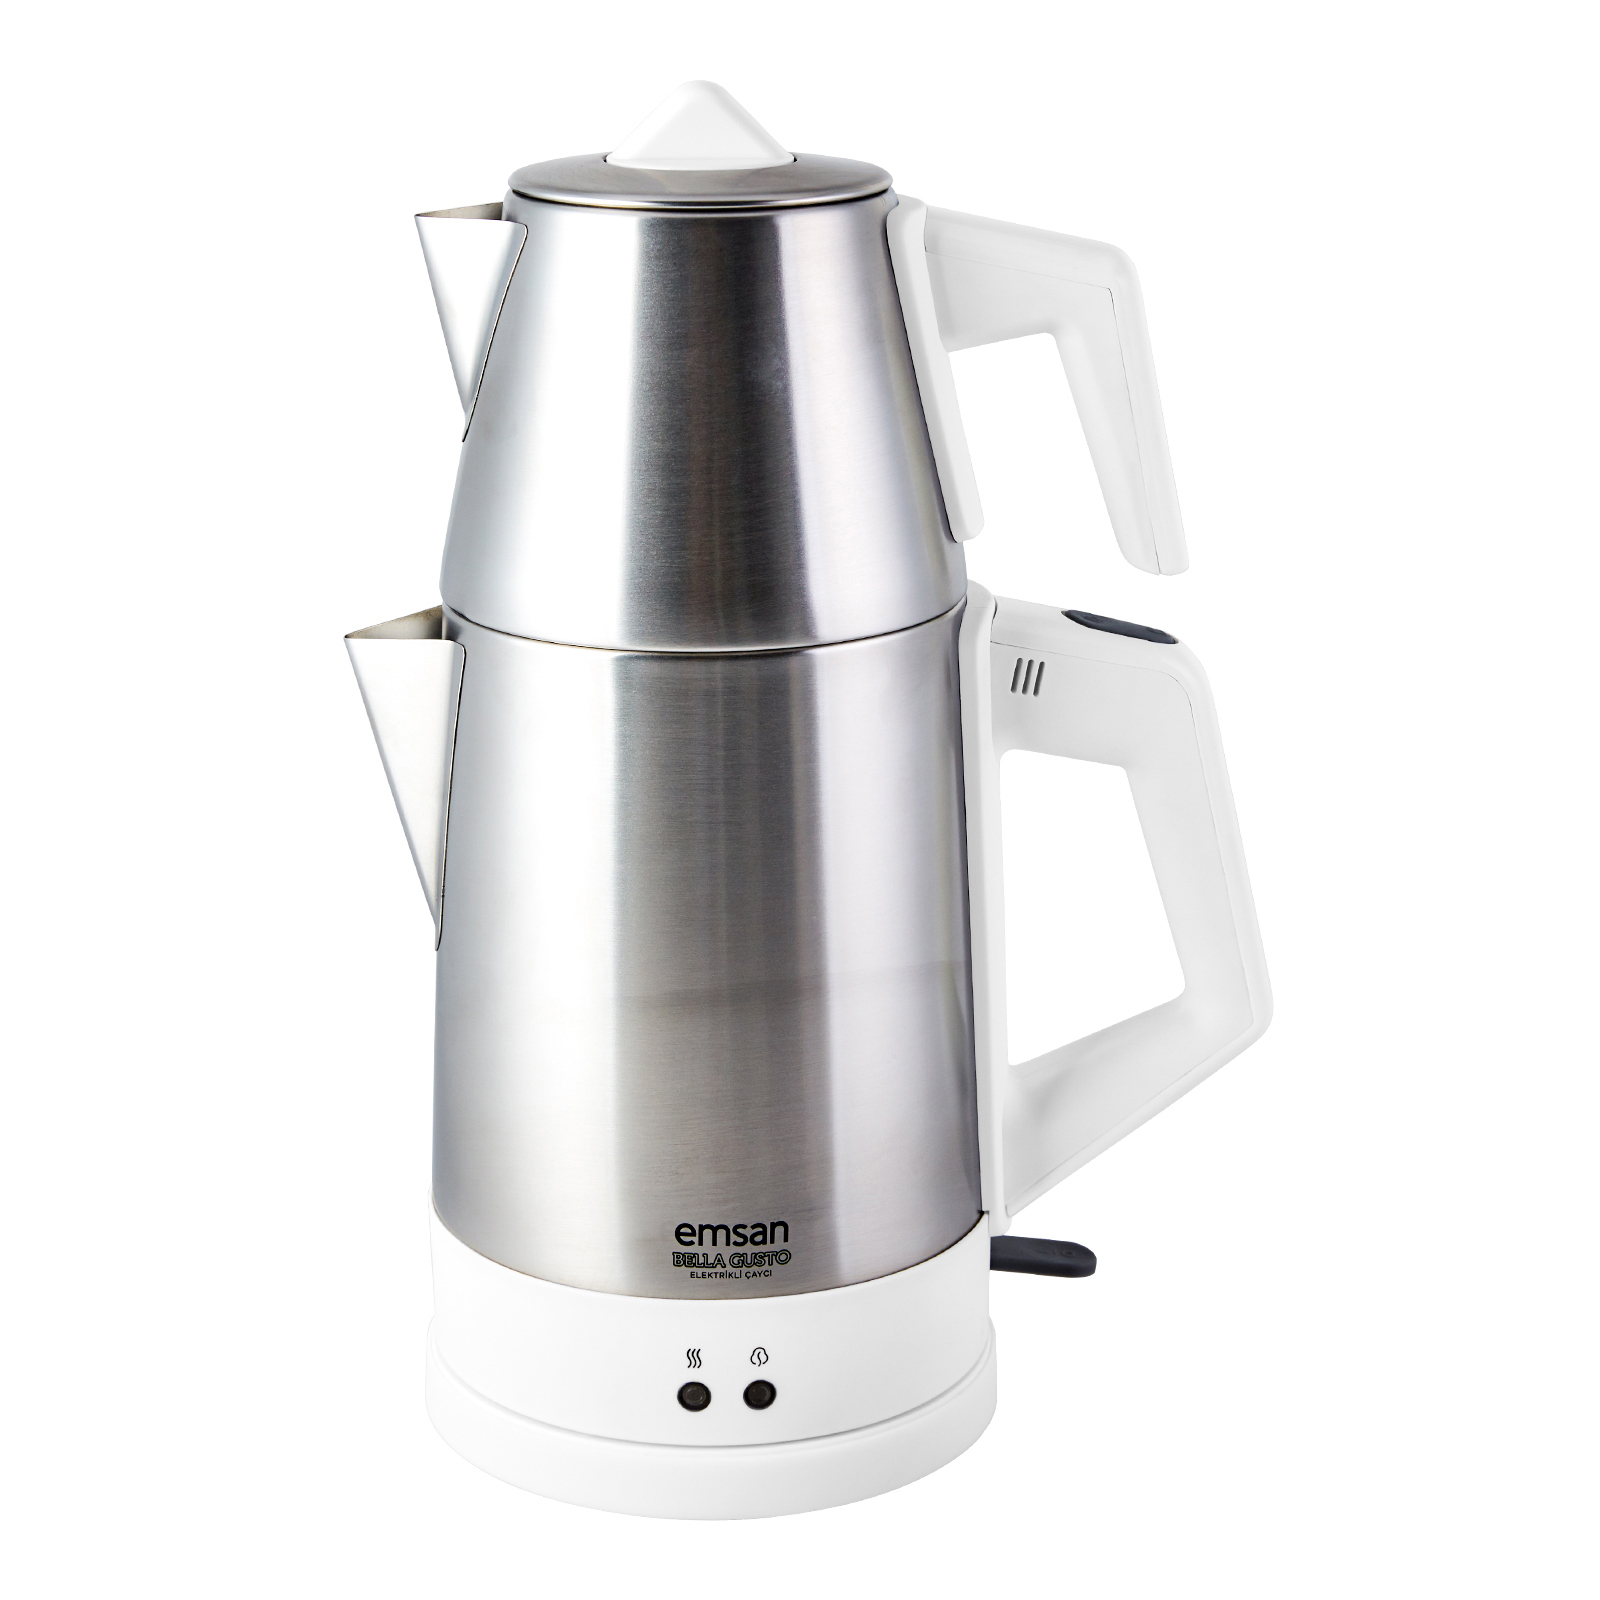 Emsan Bella Gusto Susuz Çalışma Emniyetli Elektrikli Çay Makinesi Beyaz